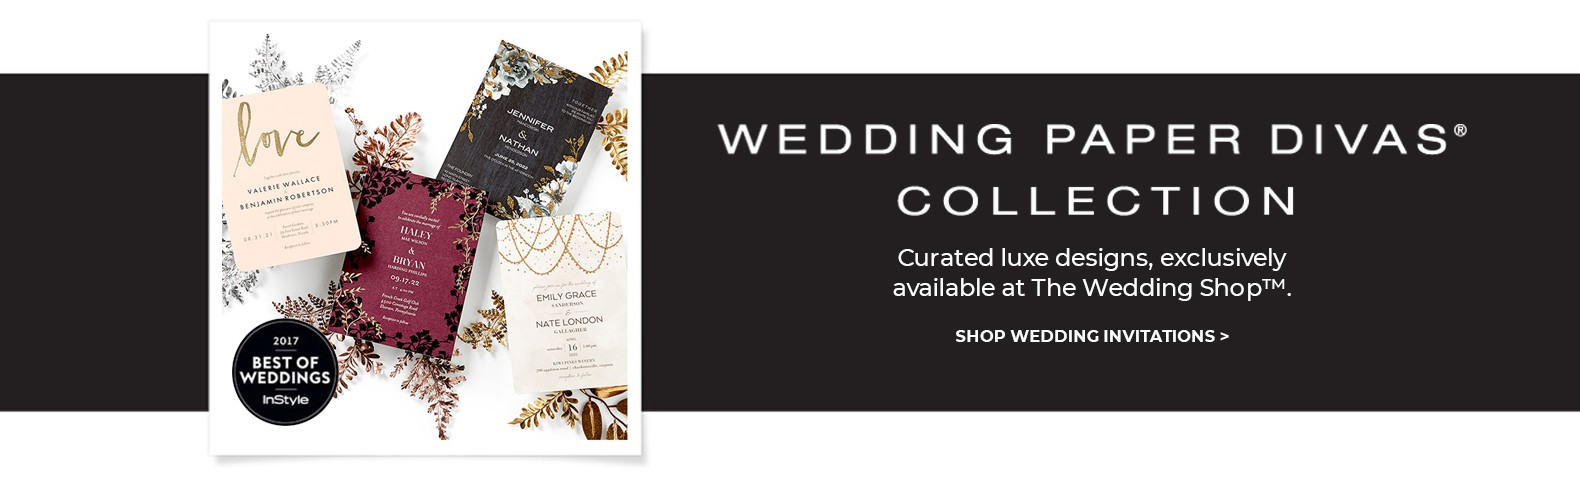 wedding paper divas collection wedding invitations online shutterfly